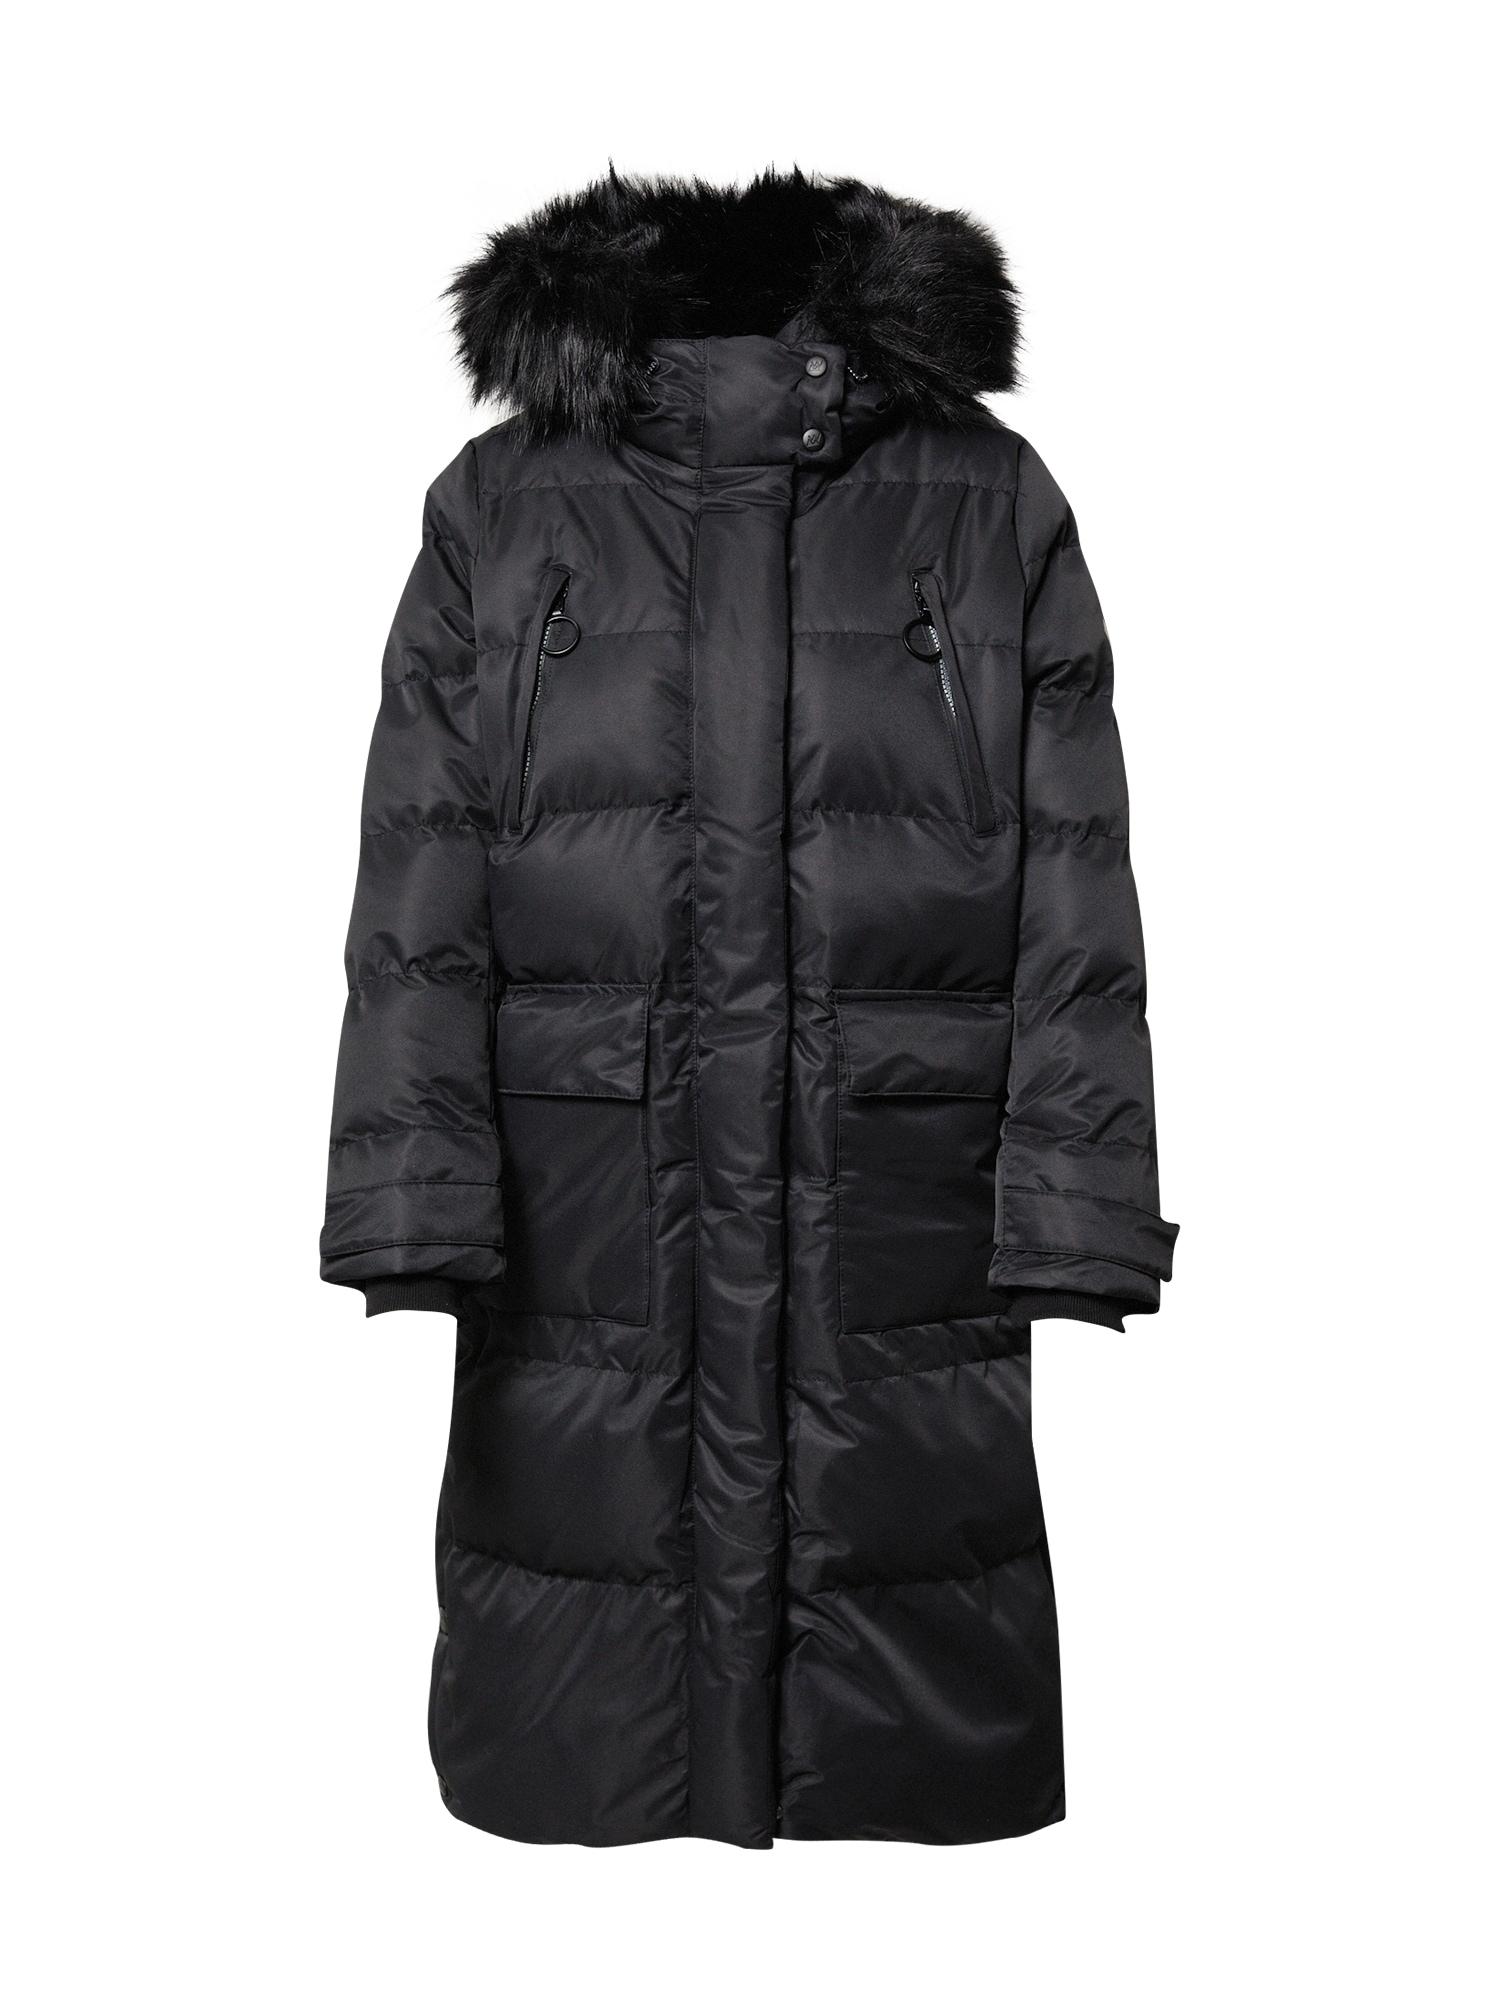 Whistler Laisvalaikio paltas